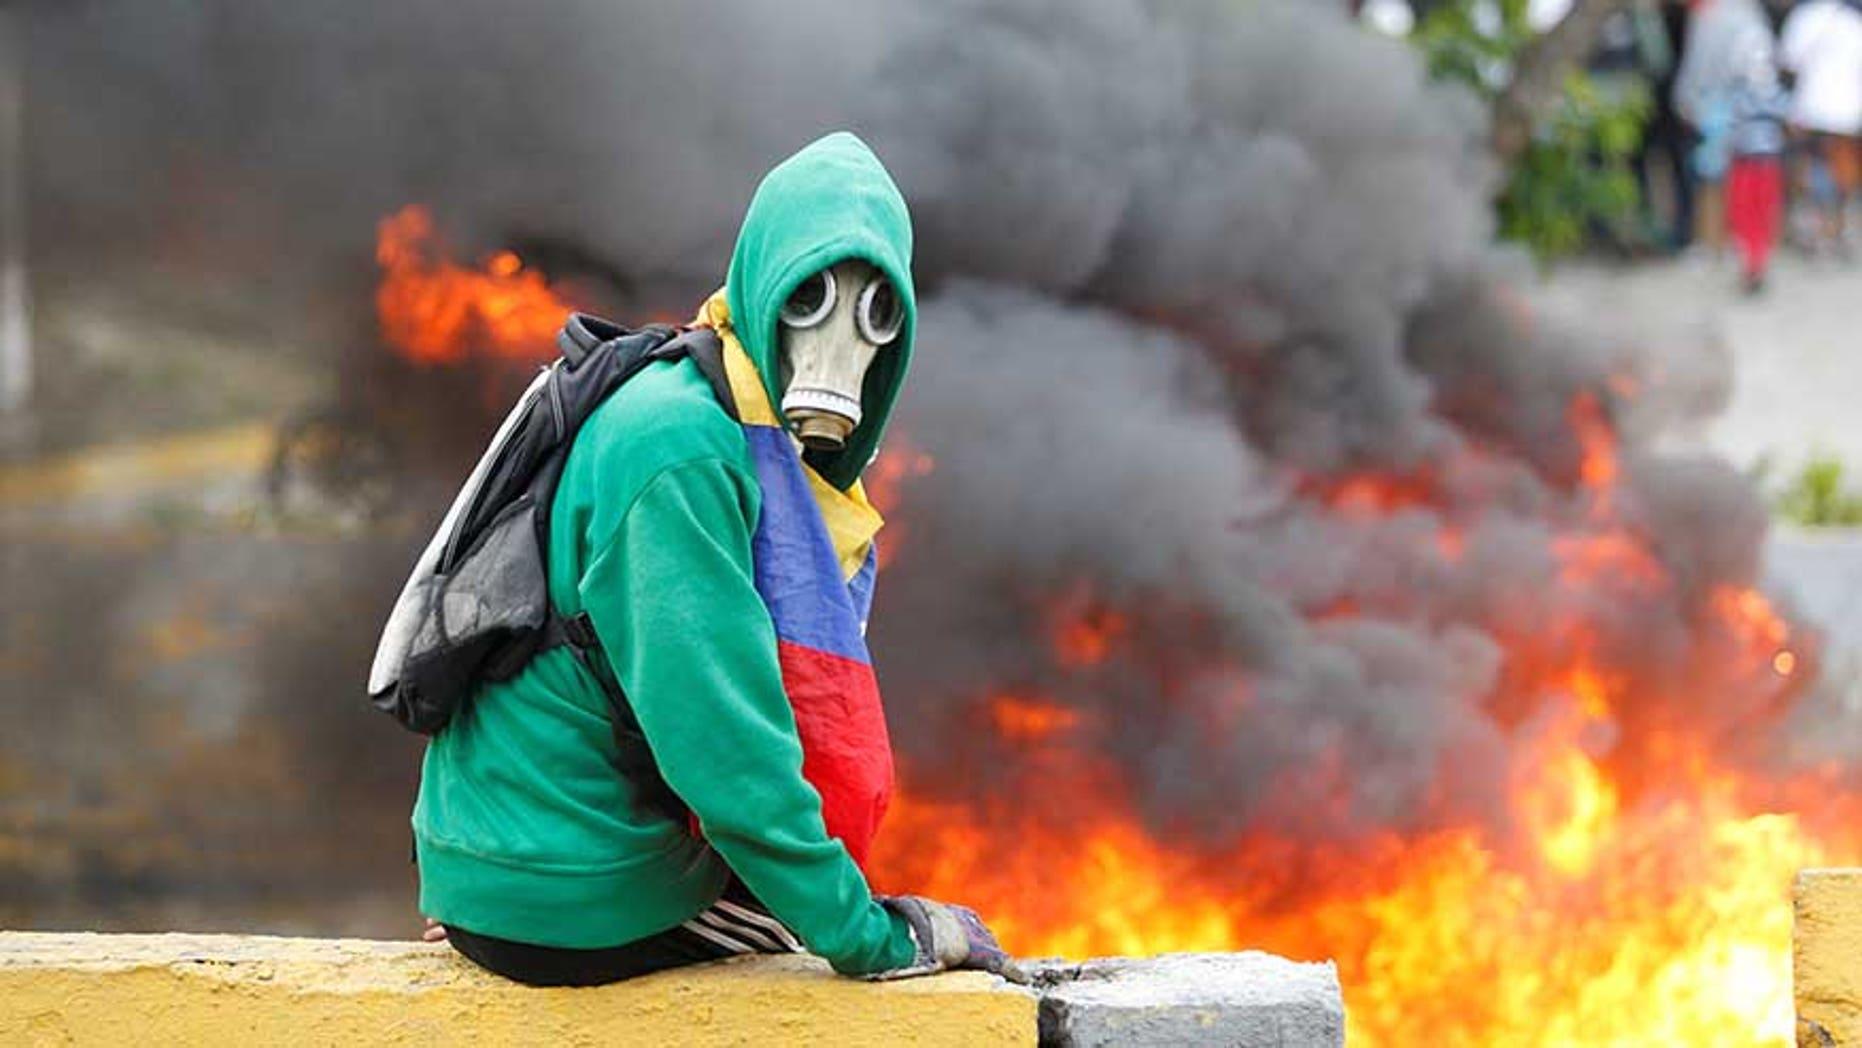 Demonstrator sits next to a fire barricade on a street during a rally against Venezuela's President Nicolas Maduro in Caracas, Venezuela April 24, 2017. REUTERS/Christian Veron - RTS13RH3